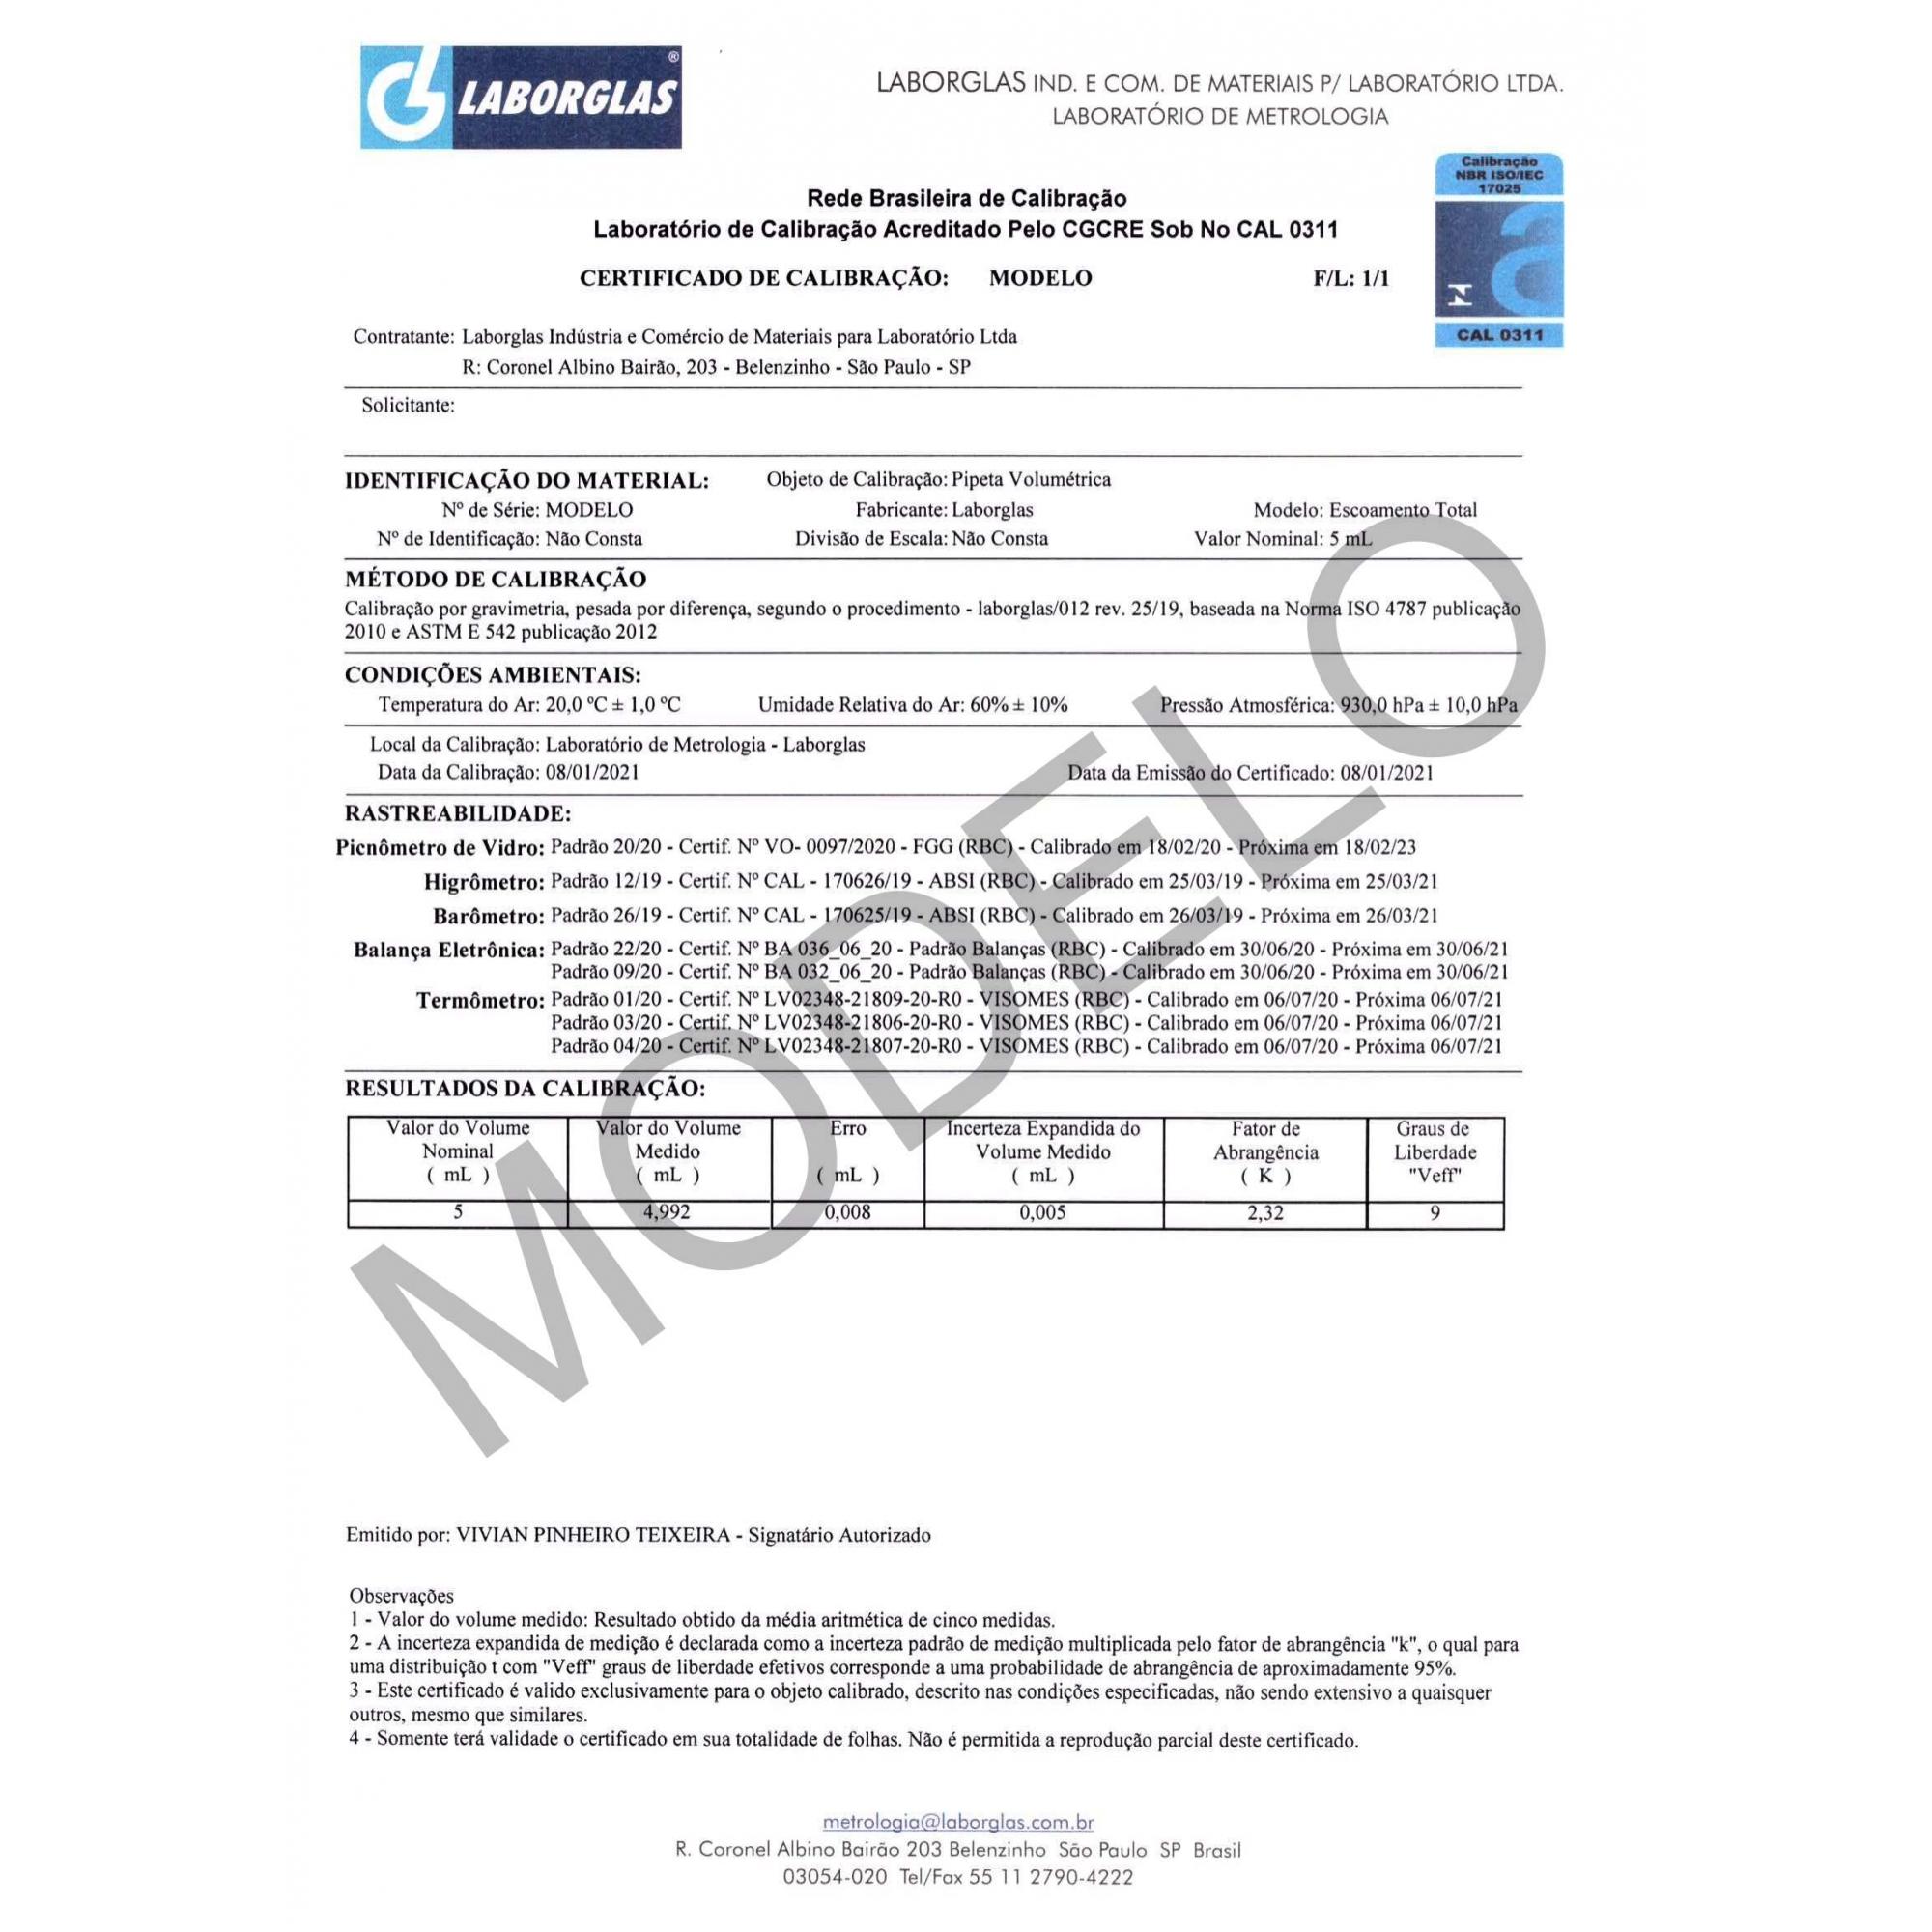 PIPETA VOLUMÉTRICA ESGOTAMENTO TOTAL 11 ML CERTIFICADO RBC - Laborglas - Cód. 9433712-R